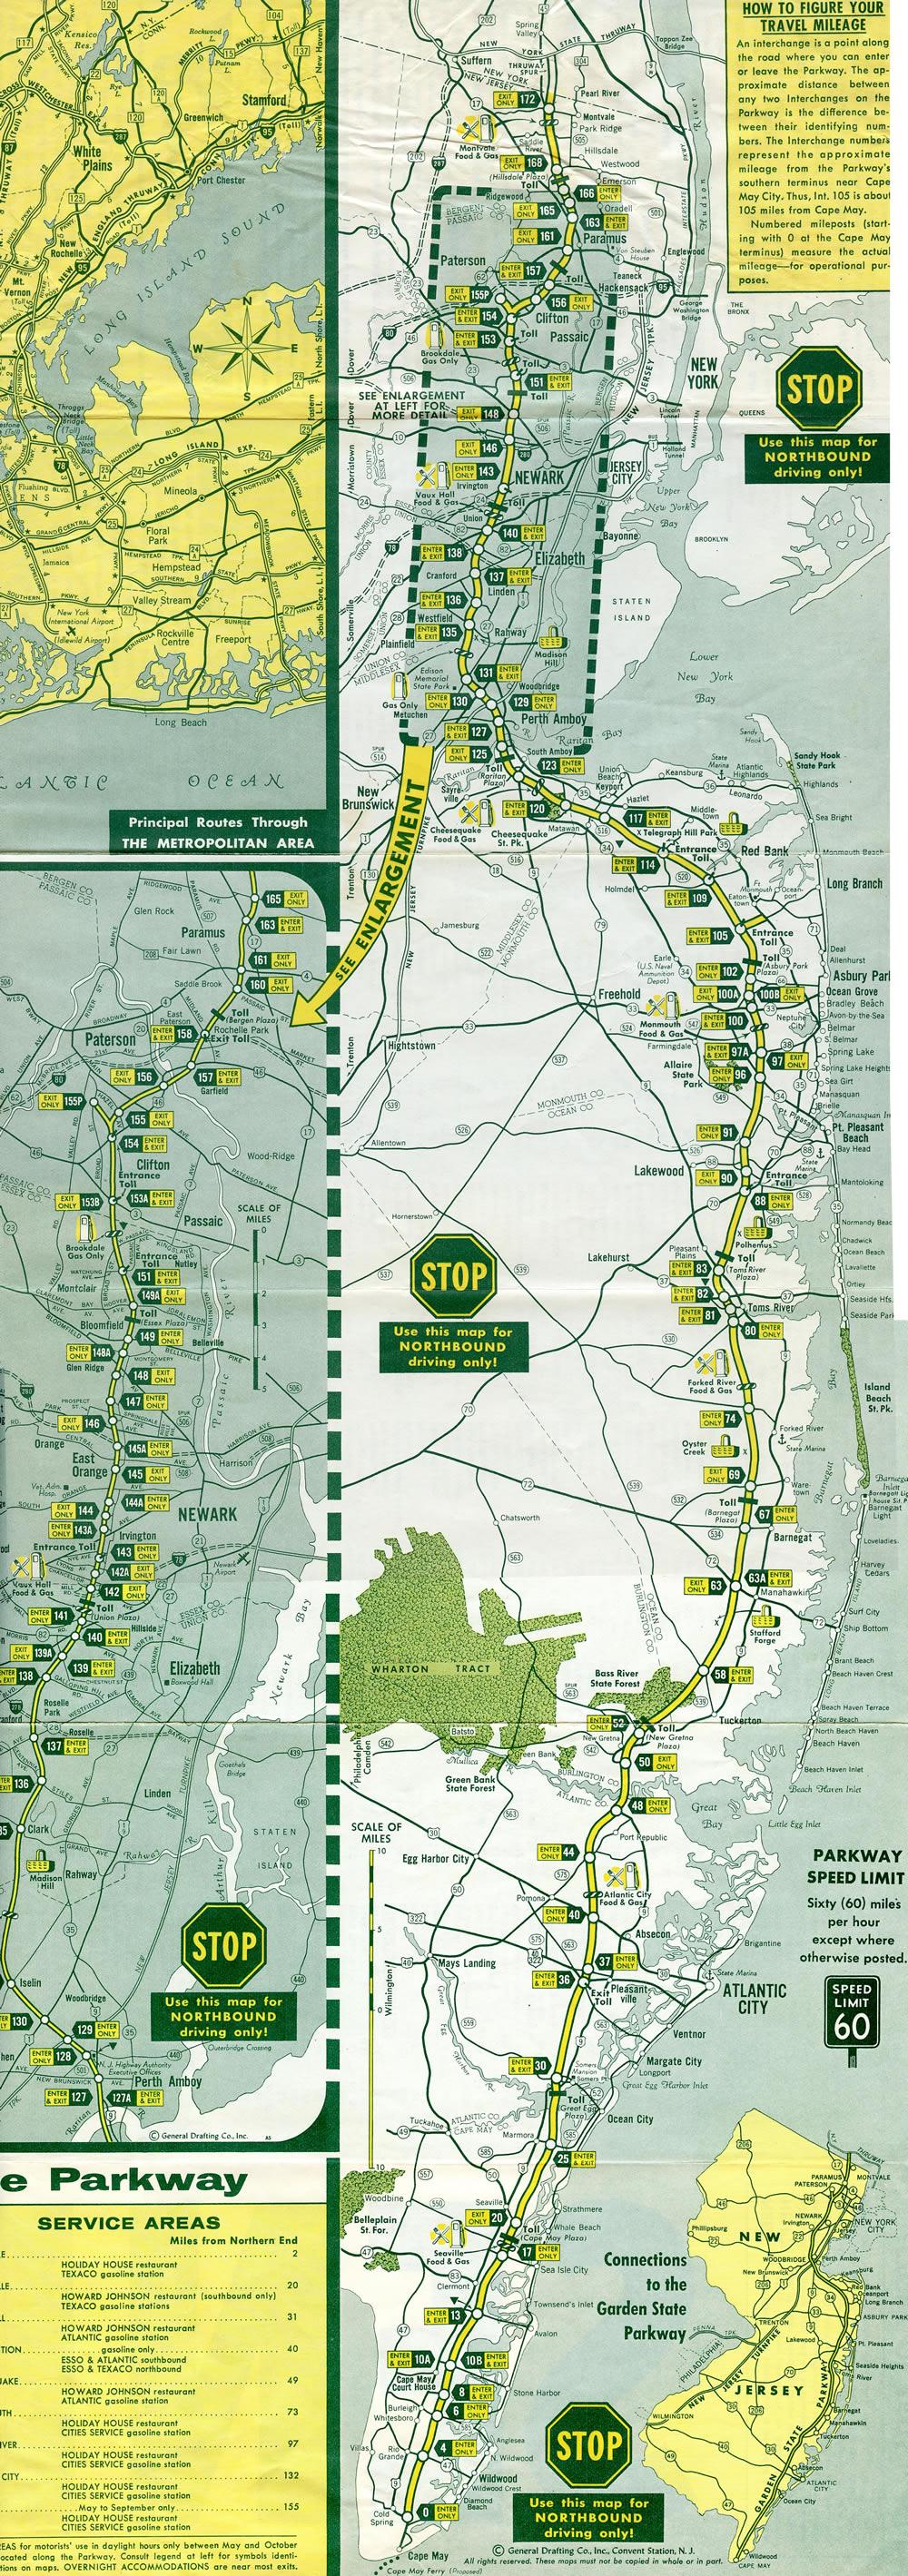 New jersey aaroads garden state parkway for Directions to garden state parkway south